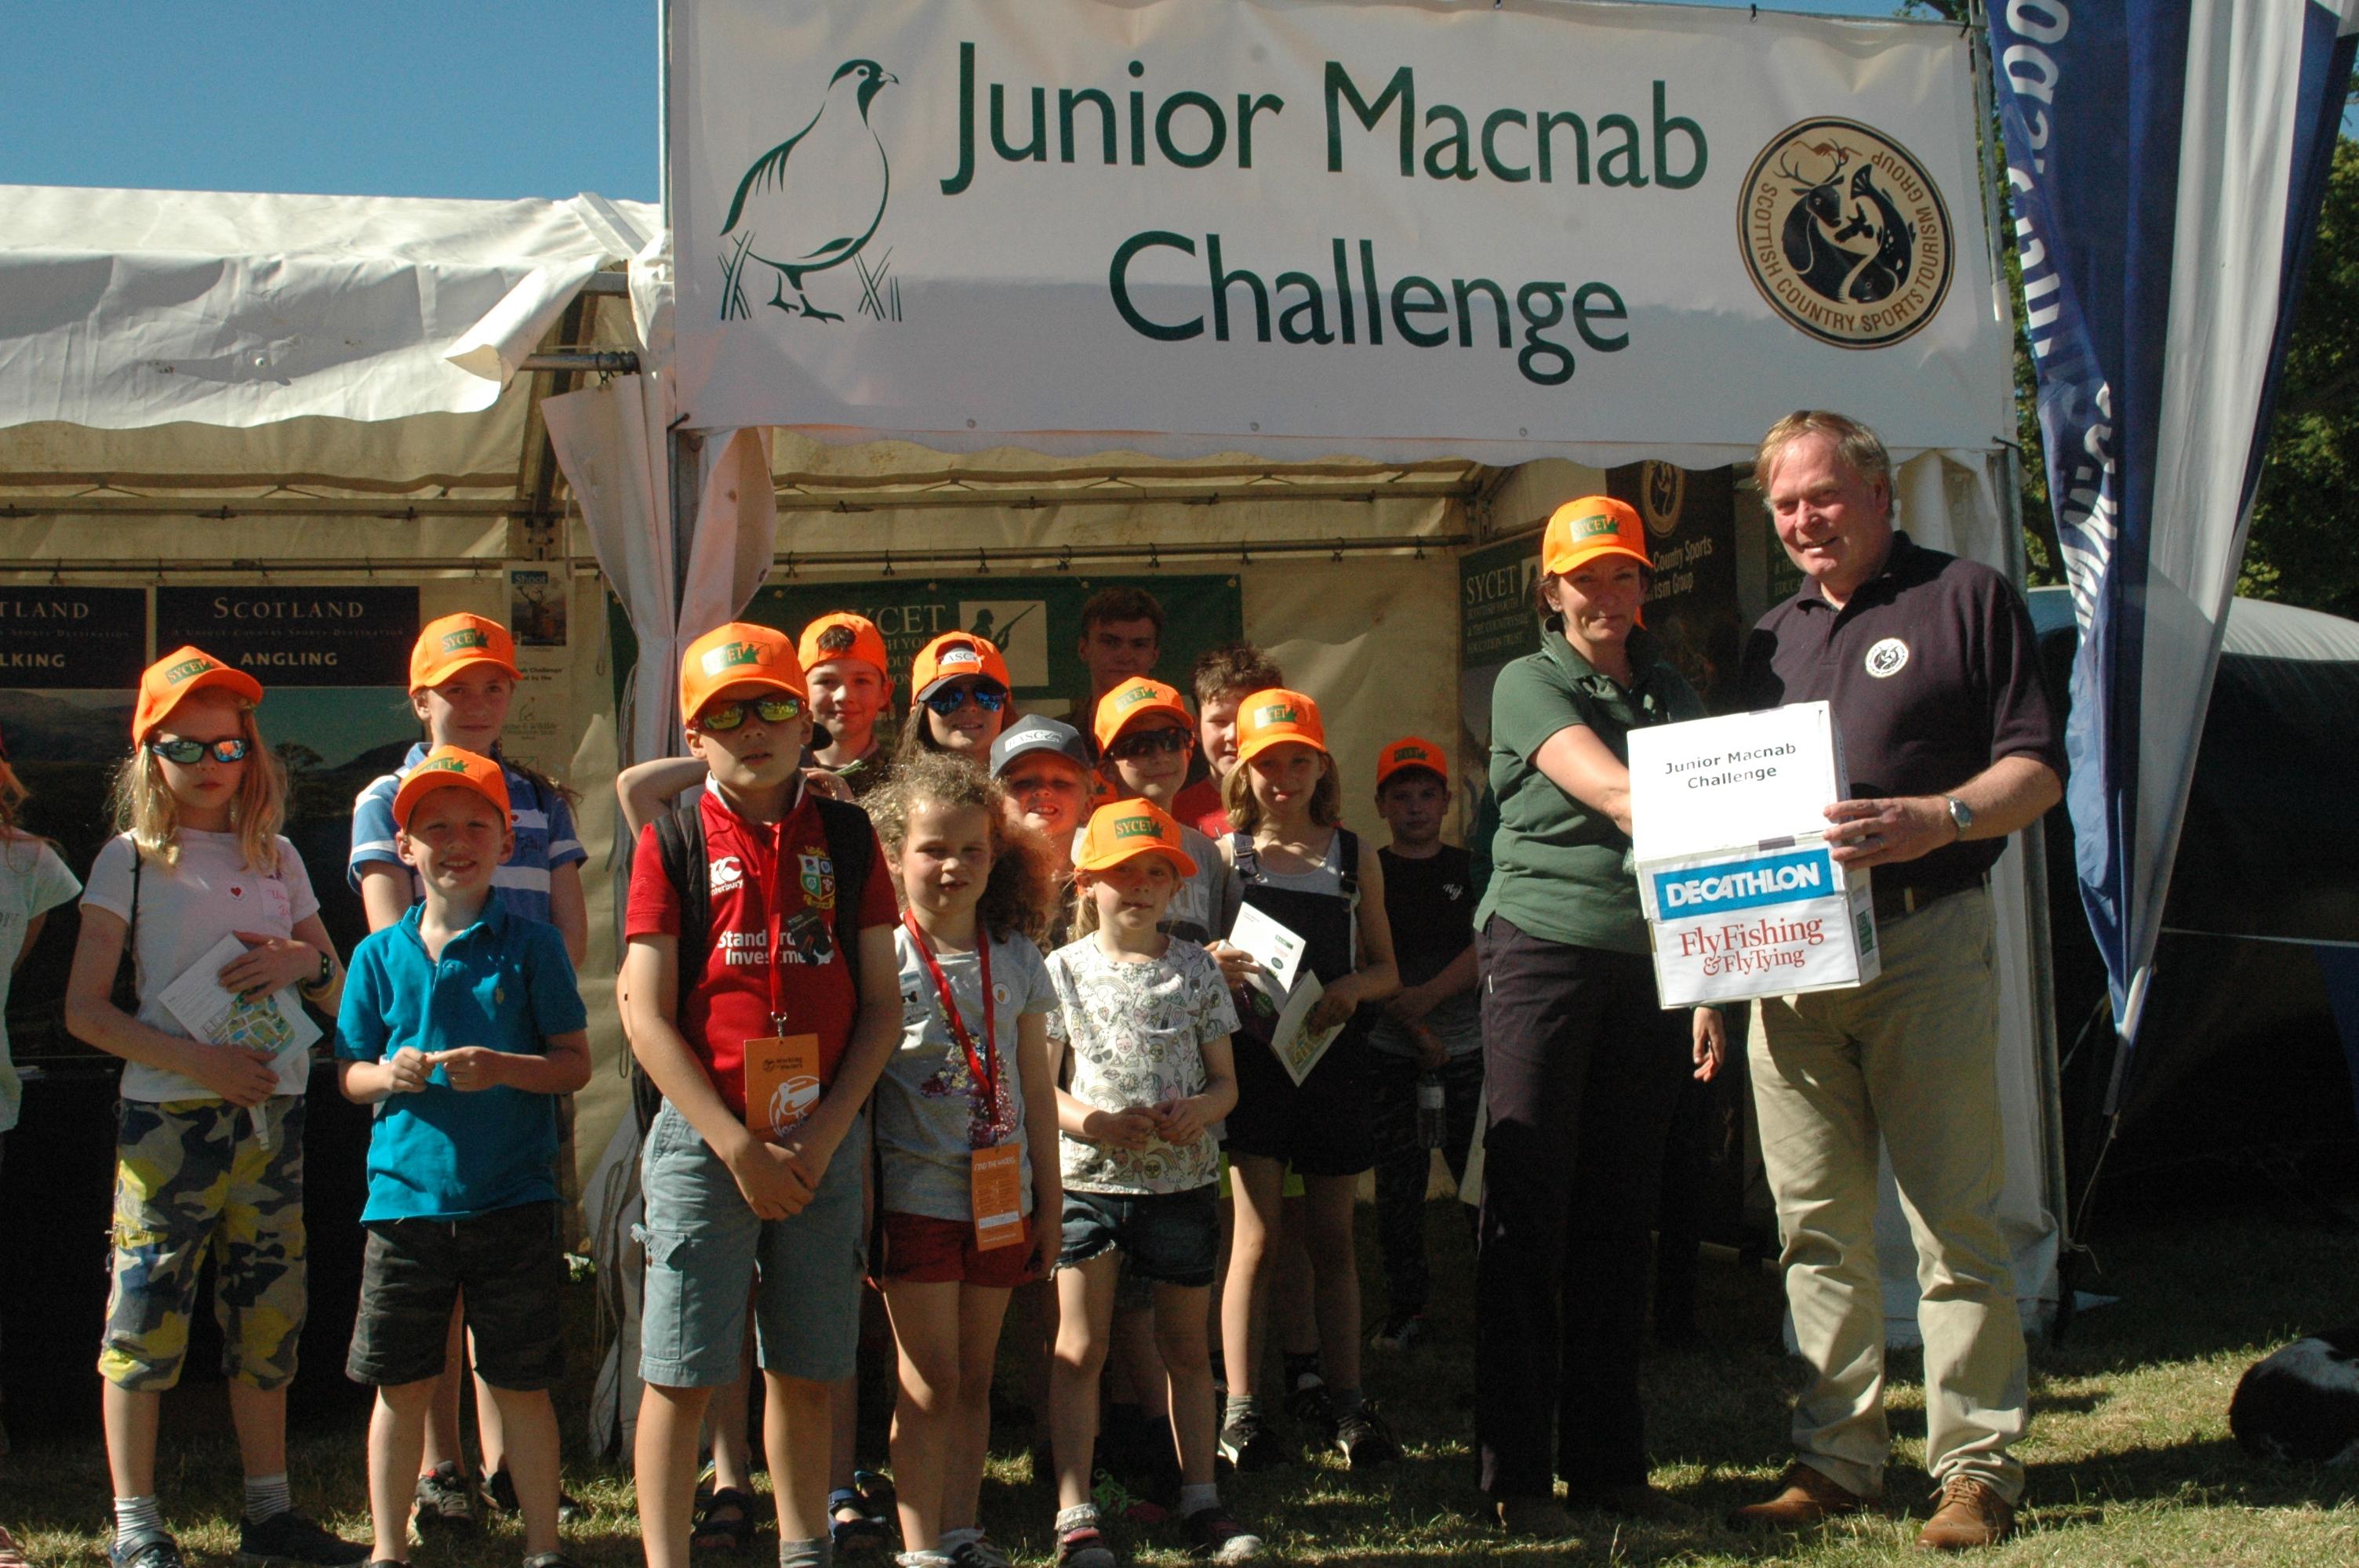 SYCET Sponsoring the Junior Macnab Challenge for 2019